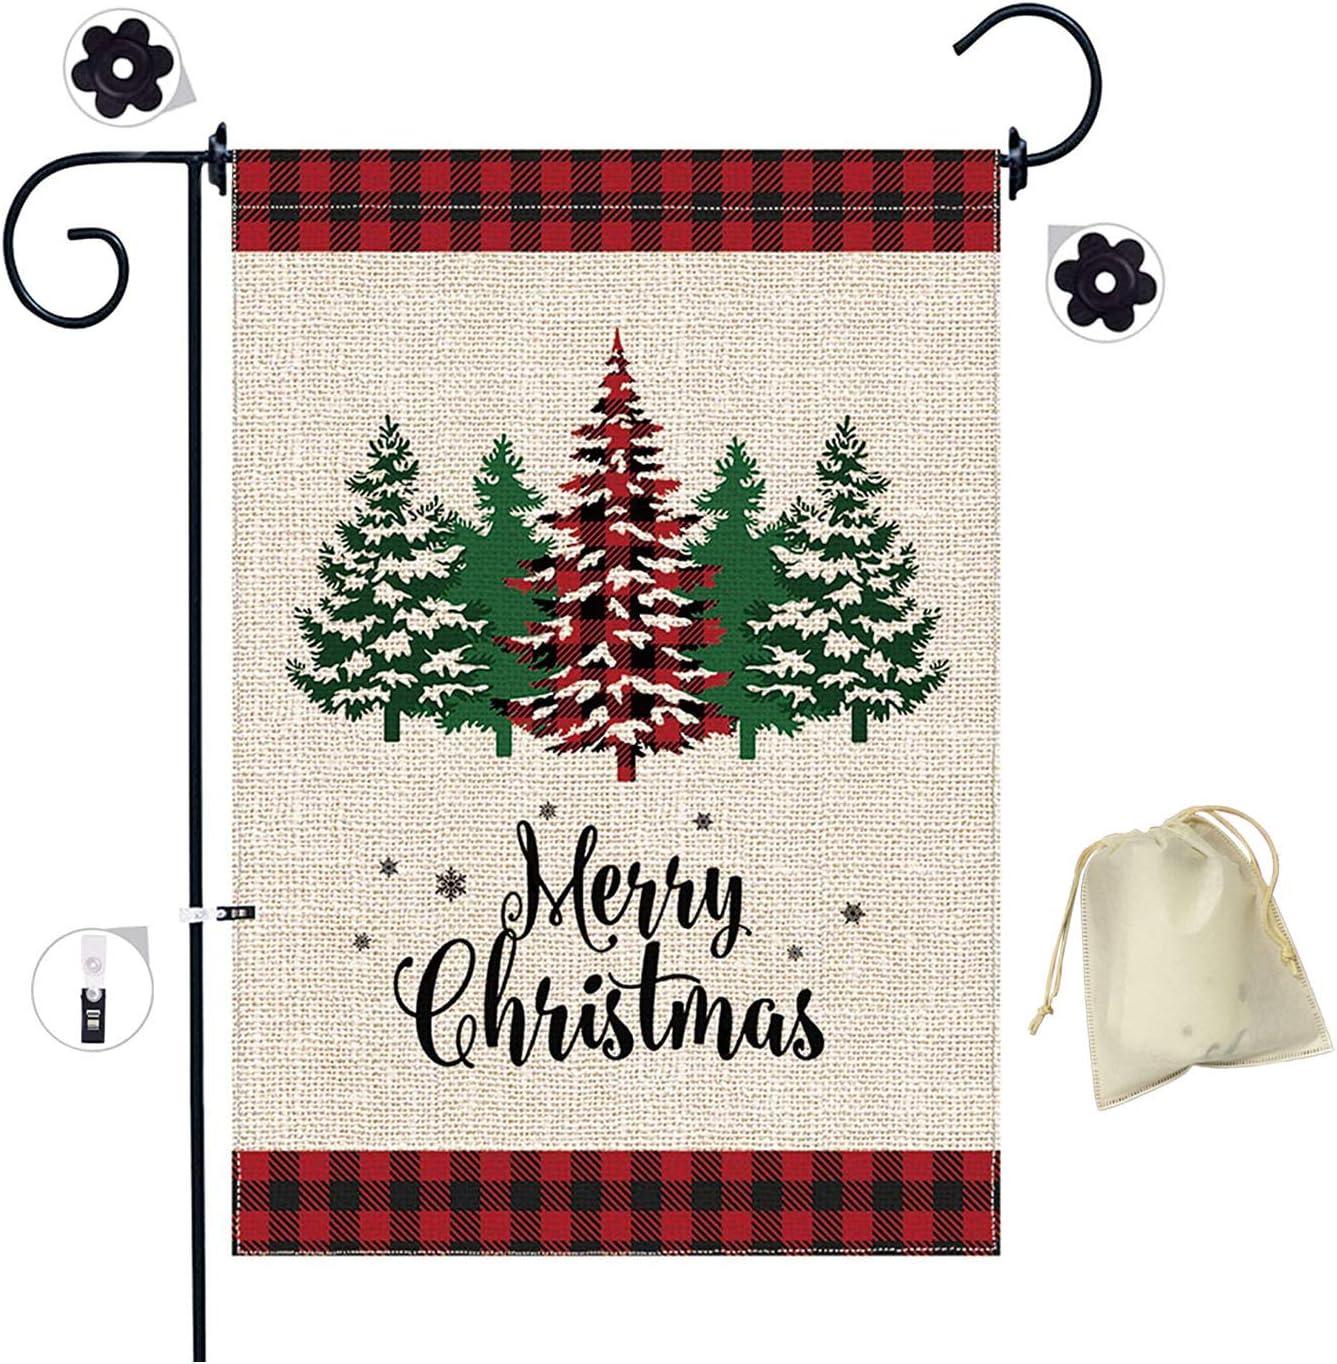 Christmas Tree Garden Flag, Merry Christmas Garden Flags Burlap, Double-Sided Red Black Buffalo Christmas Tree Flag, Buffalo Check Plaid(18 x 12 inches)